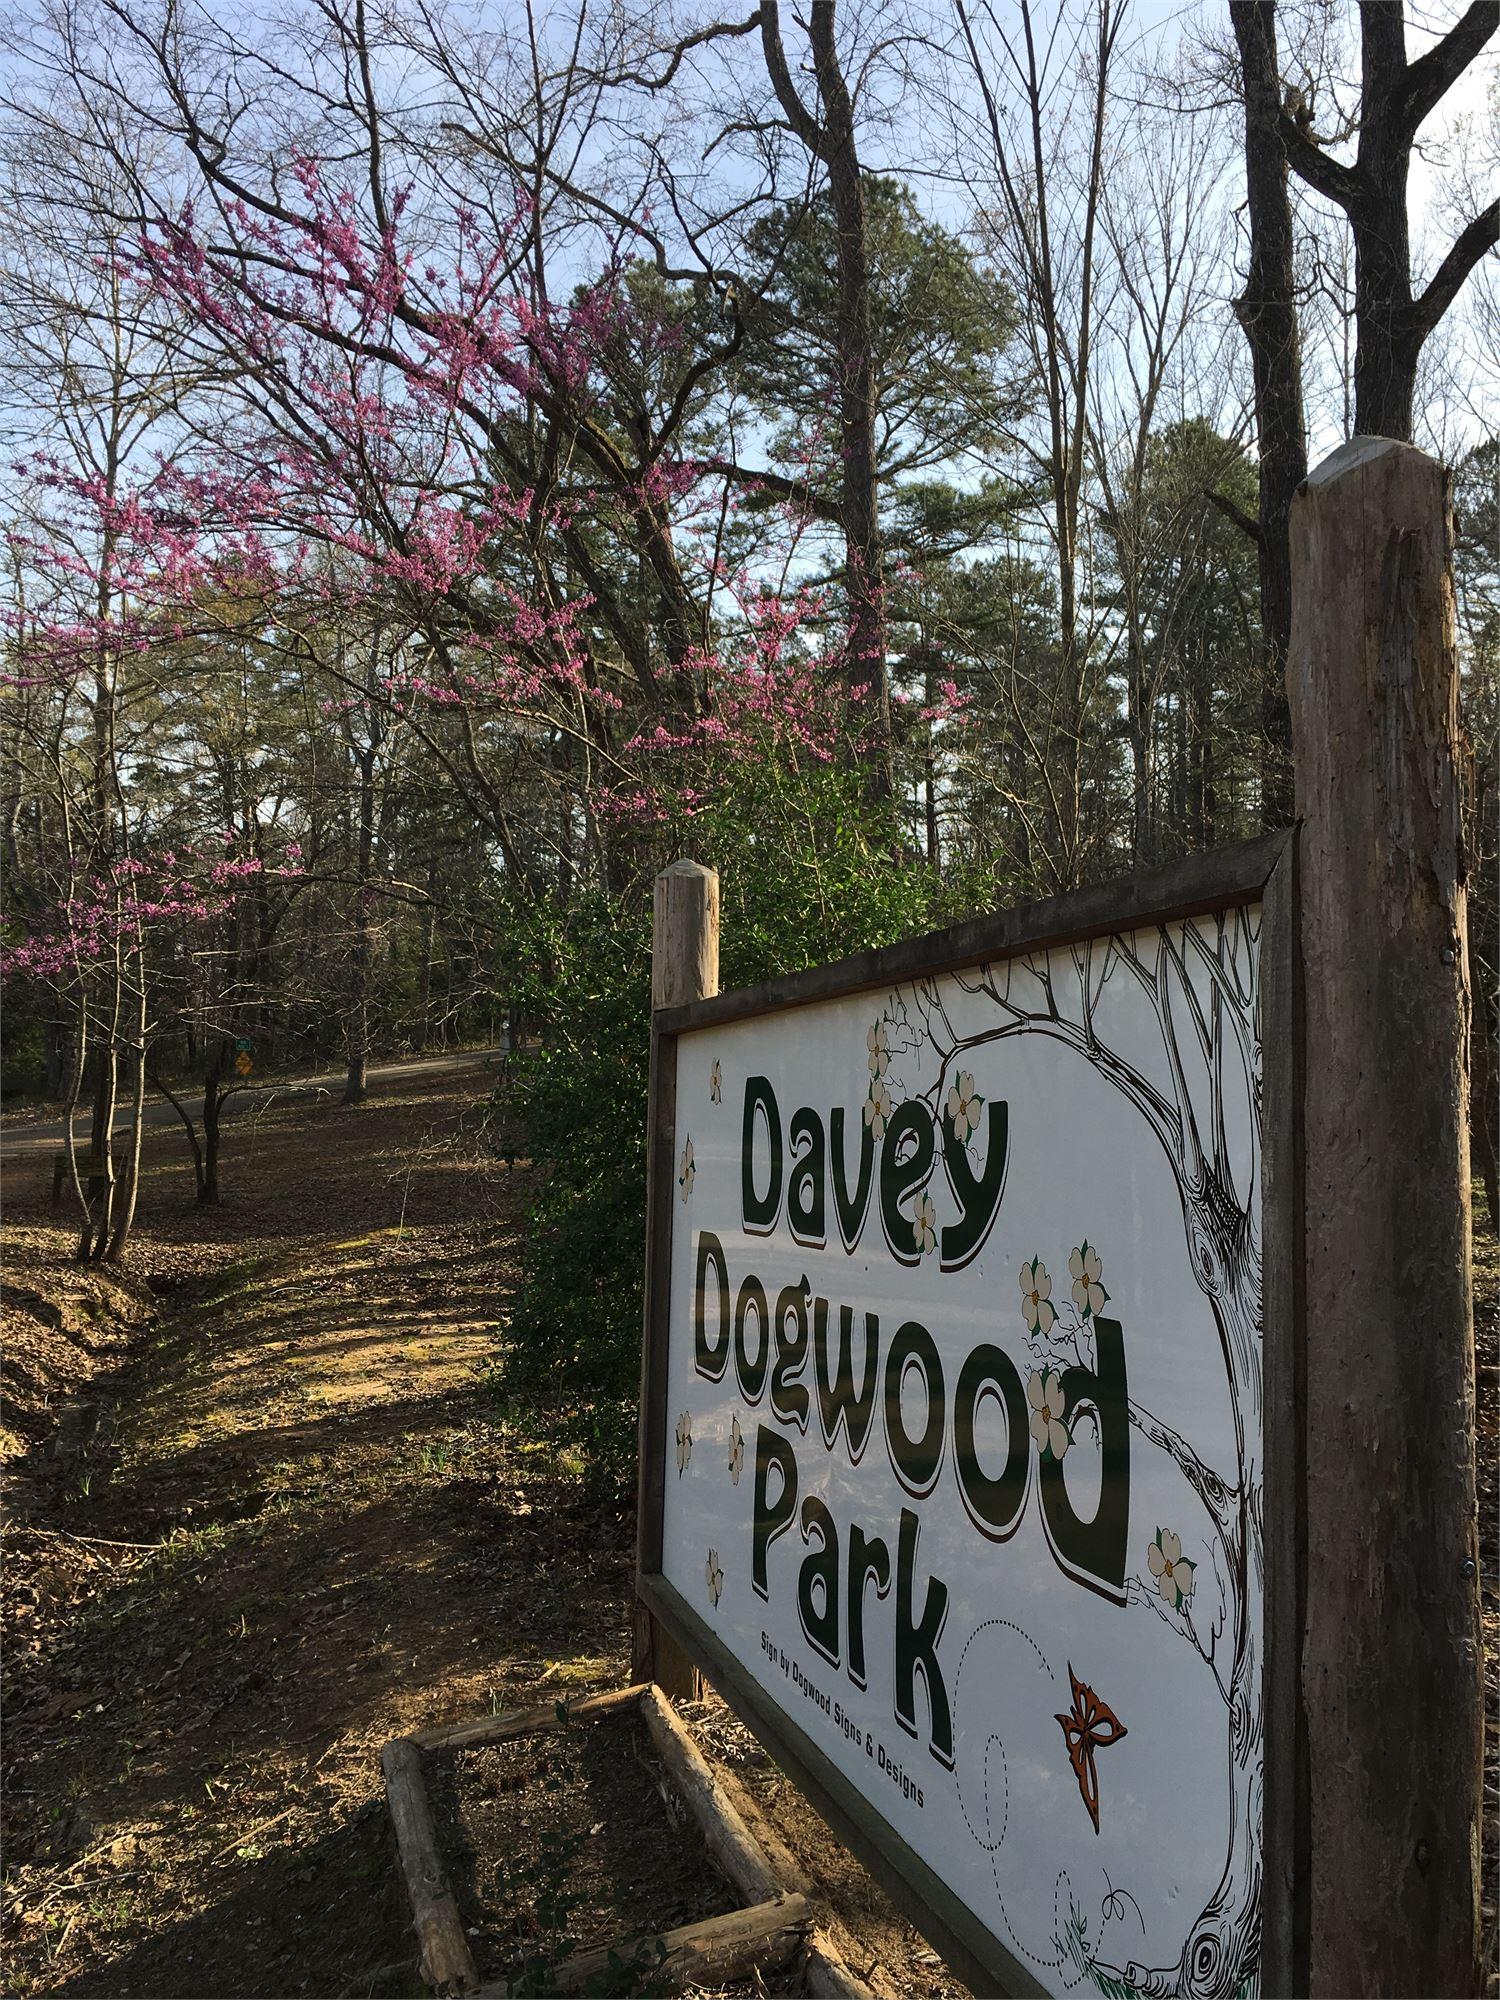 Davey Dogwood Park